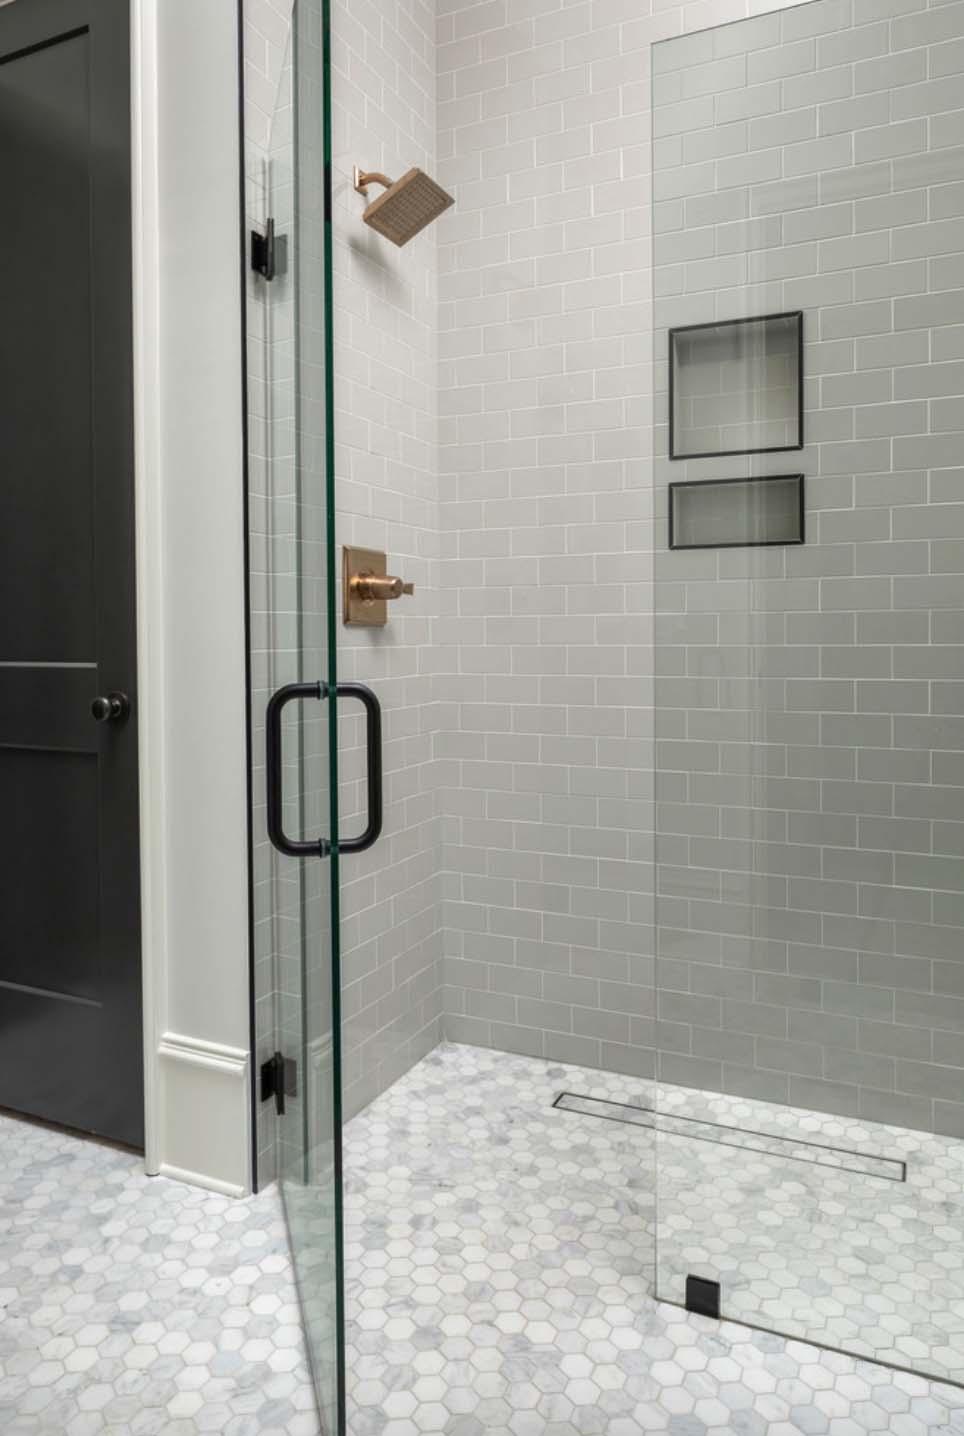 guest-bathroom-zero-entry-shower-transitional